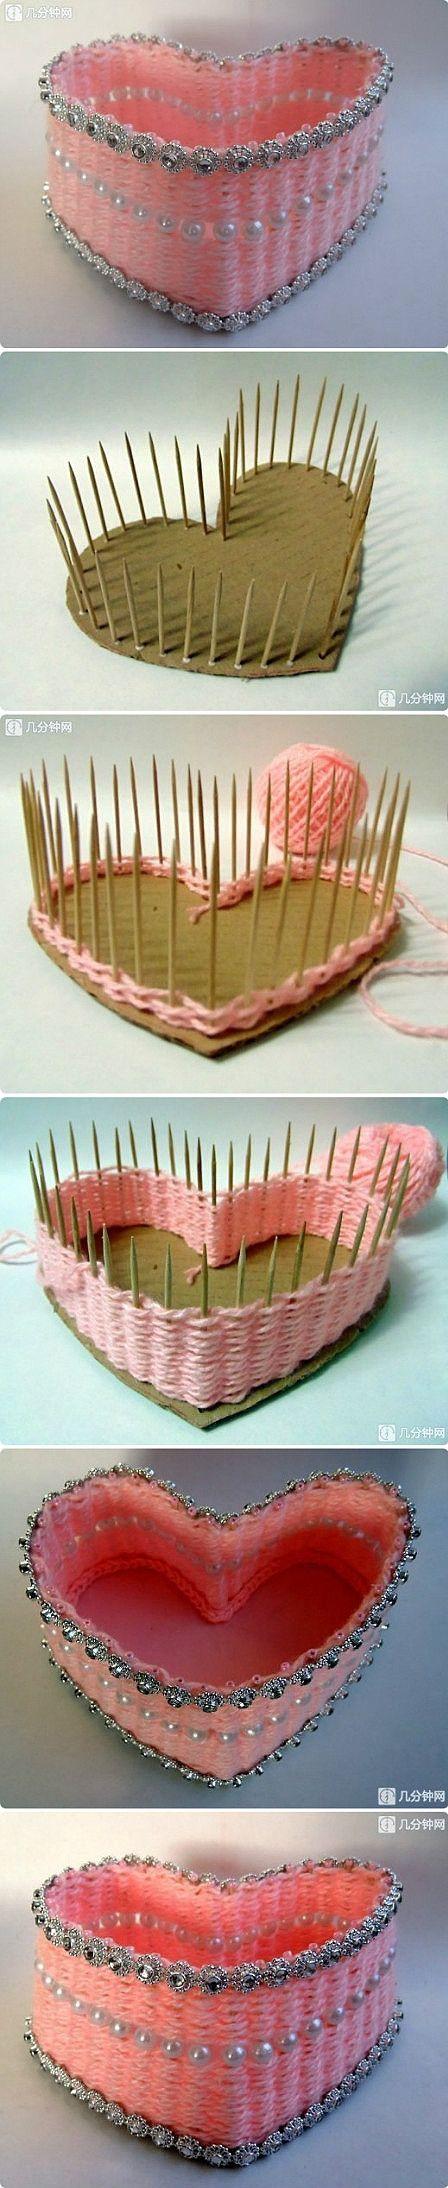 heart shaped box with yarn: